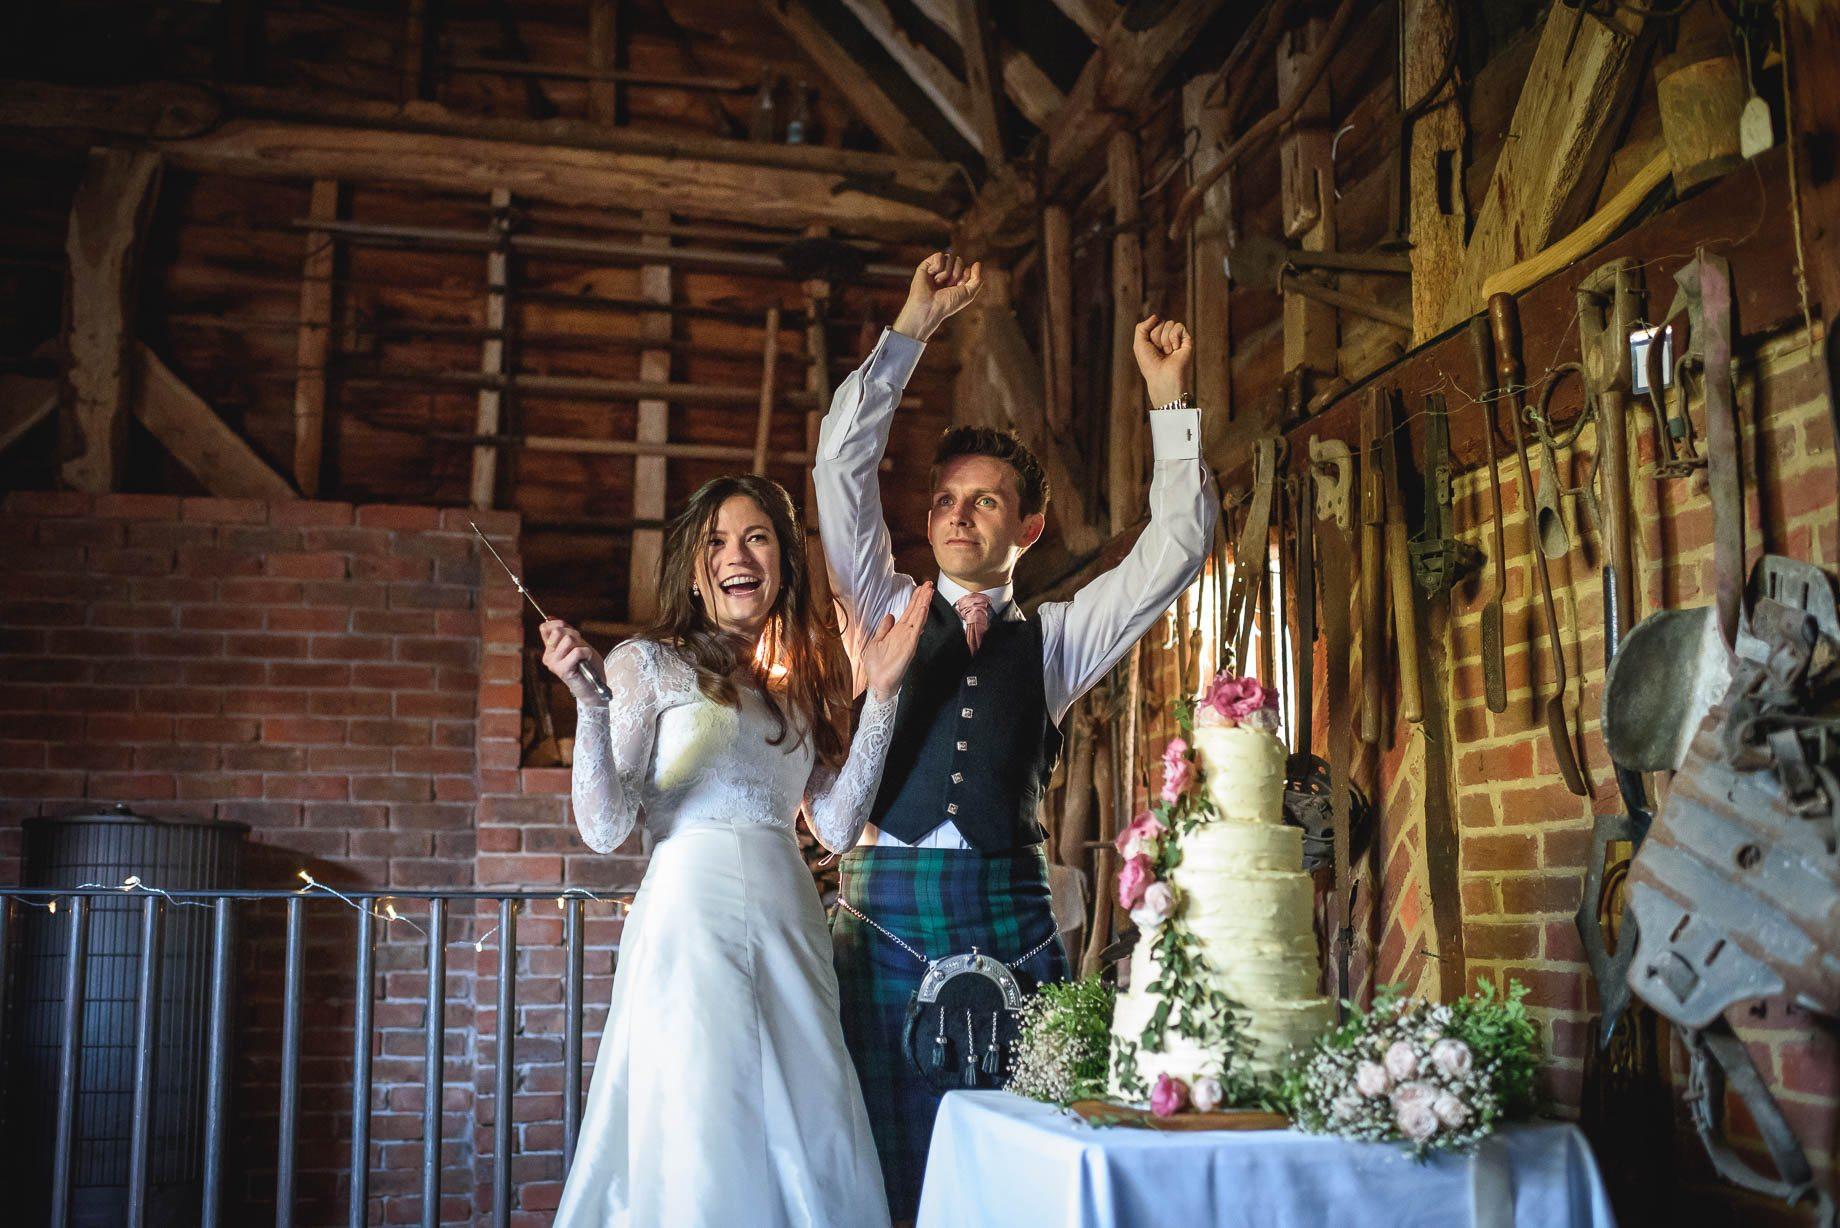 Gildings Barn wedding photography - Sarah and Steve (174 of 190)